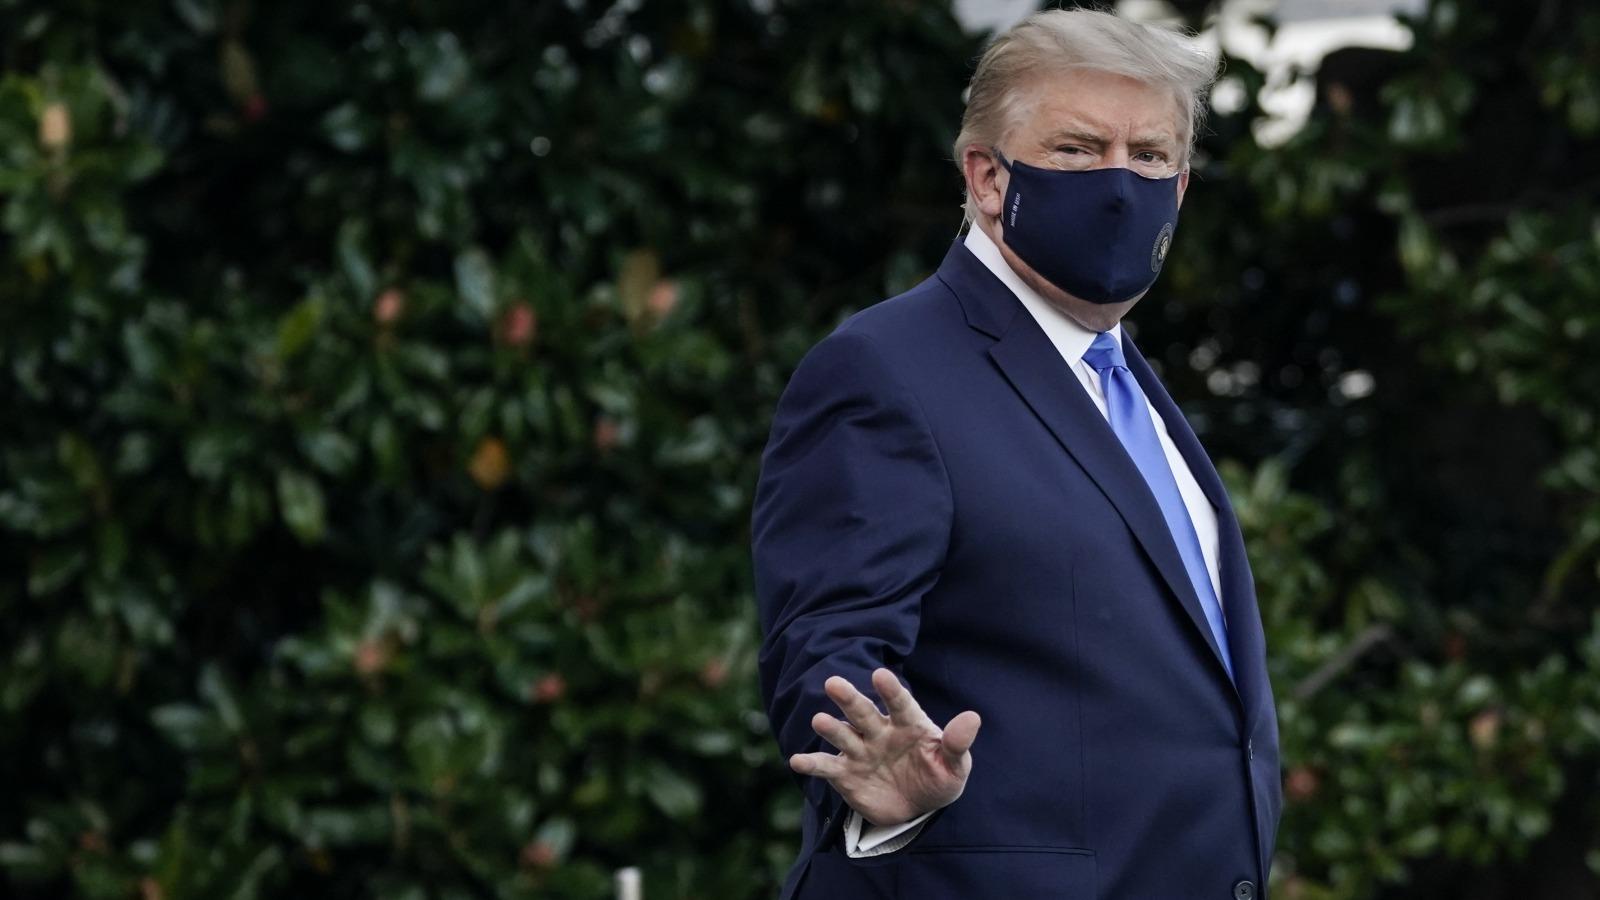 Donald Trump with facemask